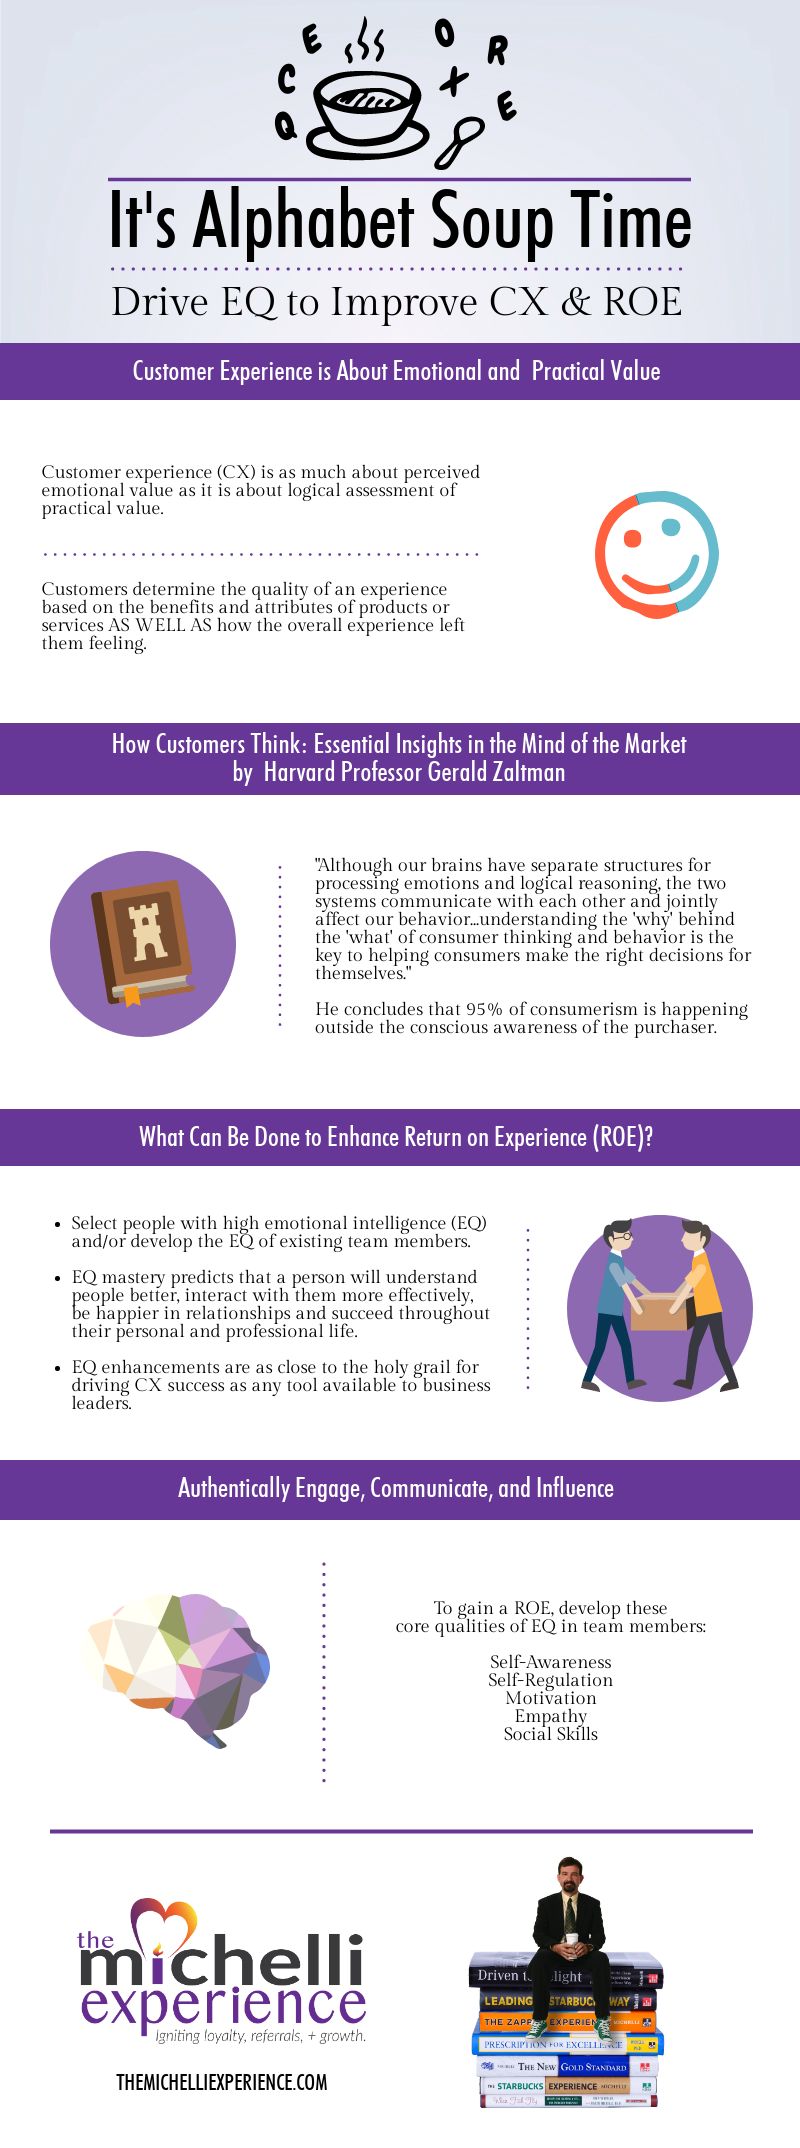 customer experience, emotional intelligence, return on experience